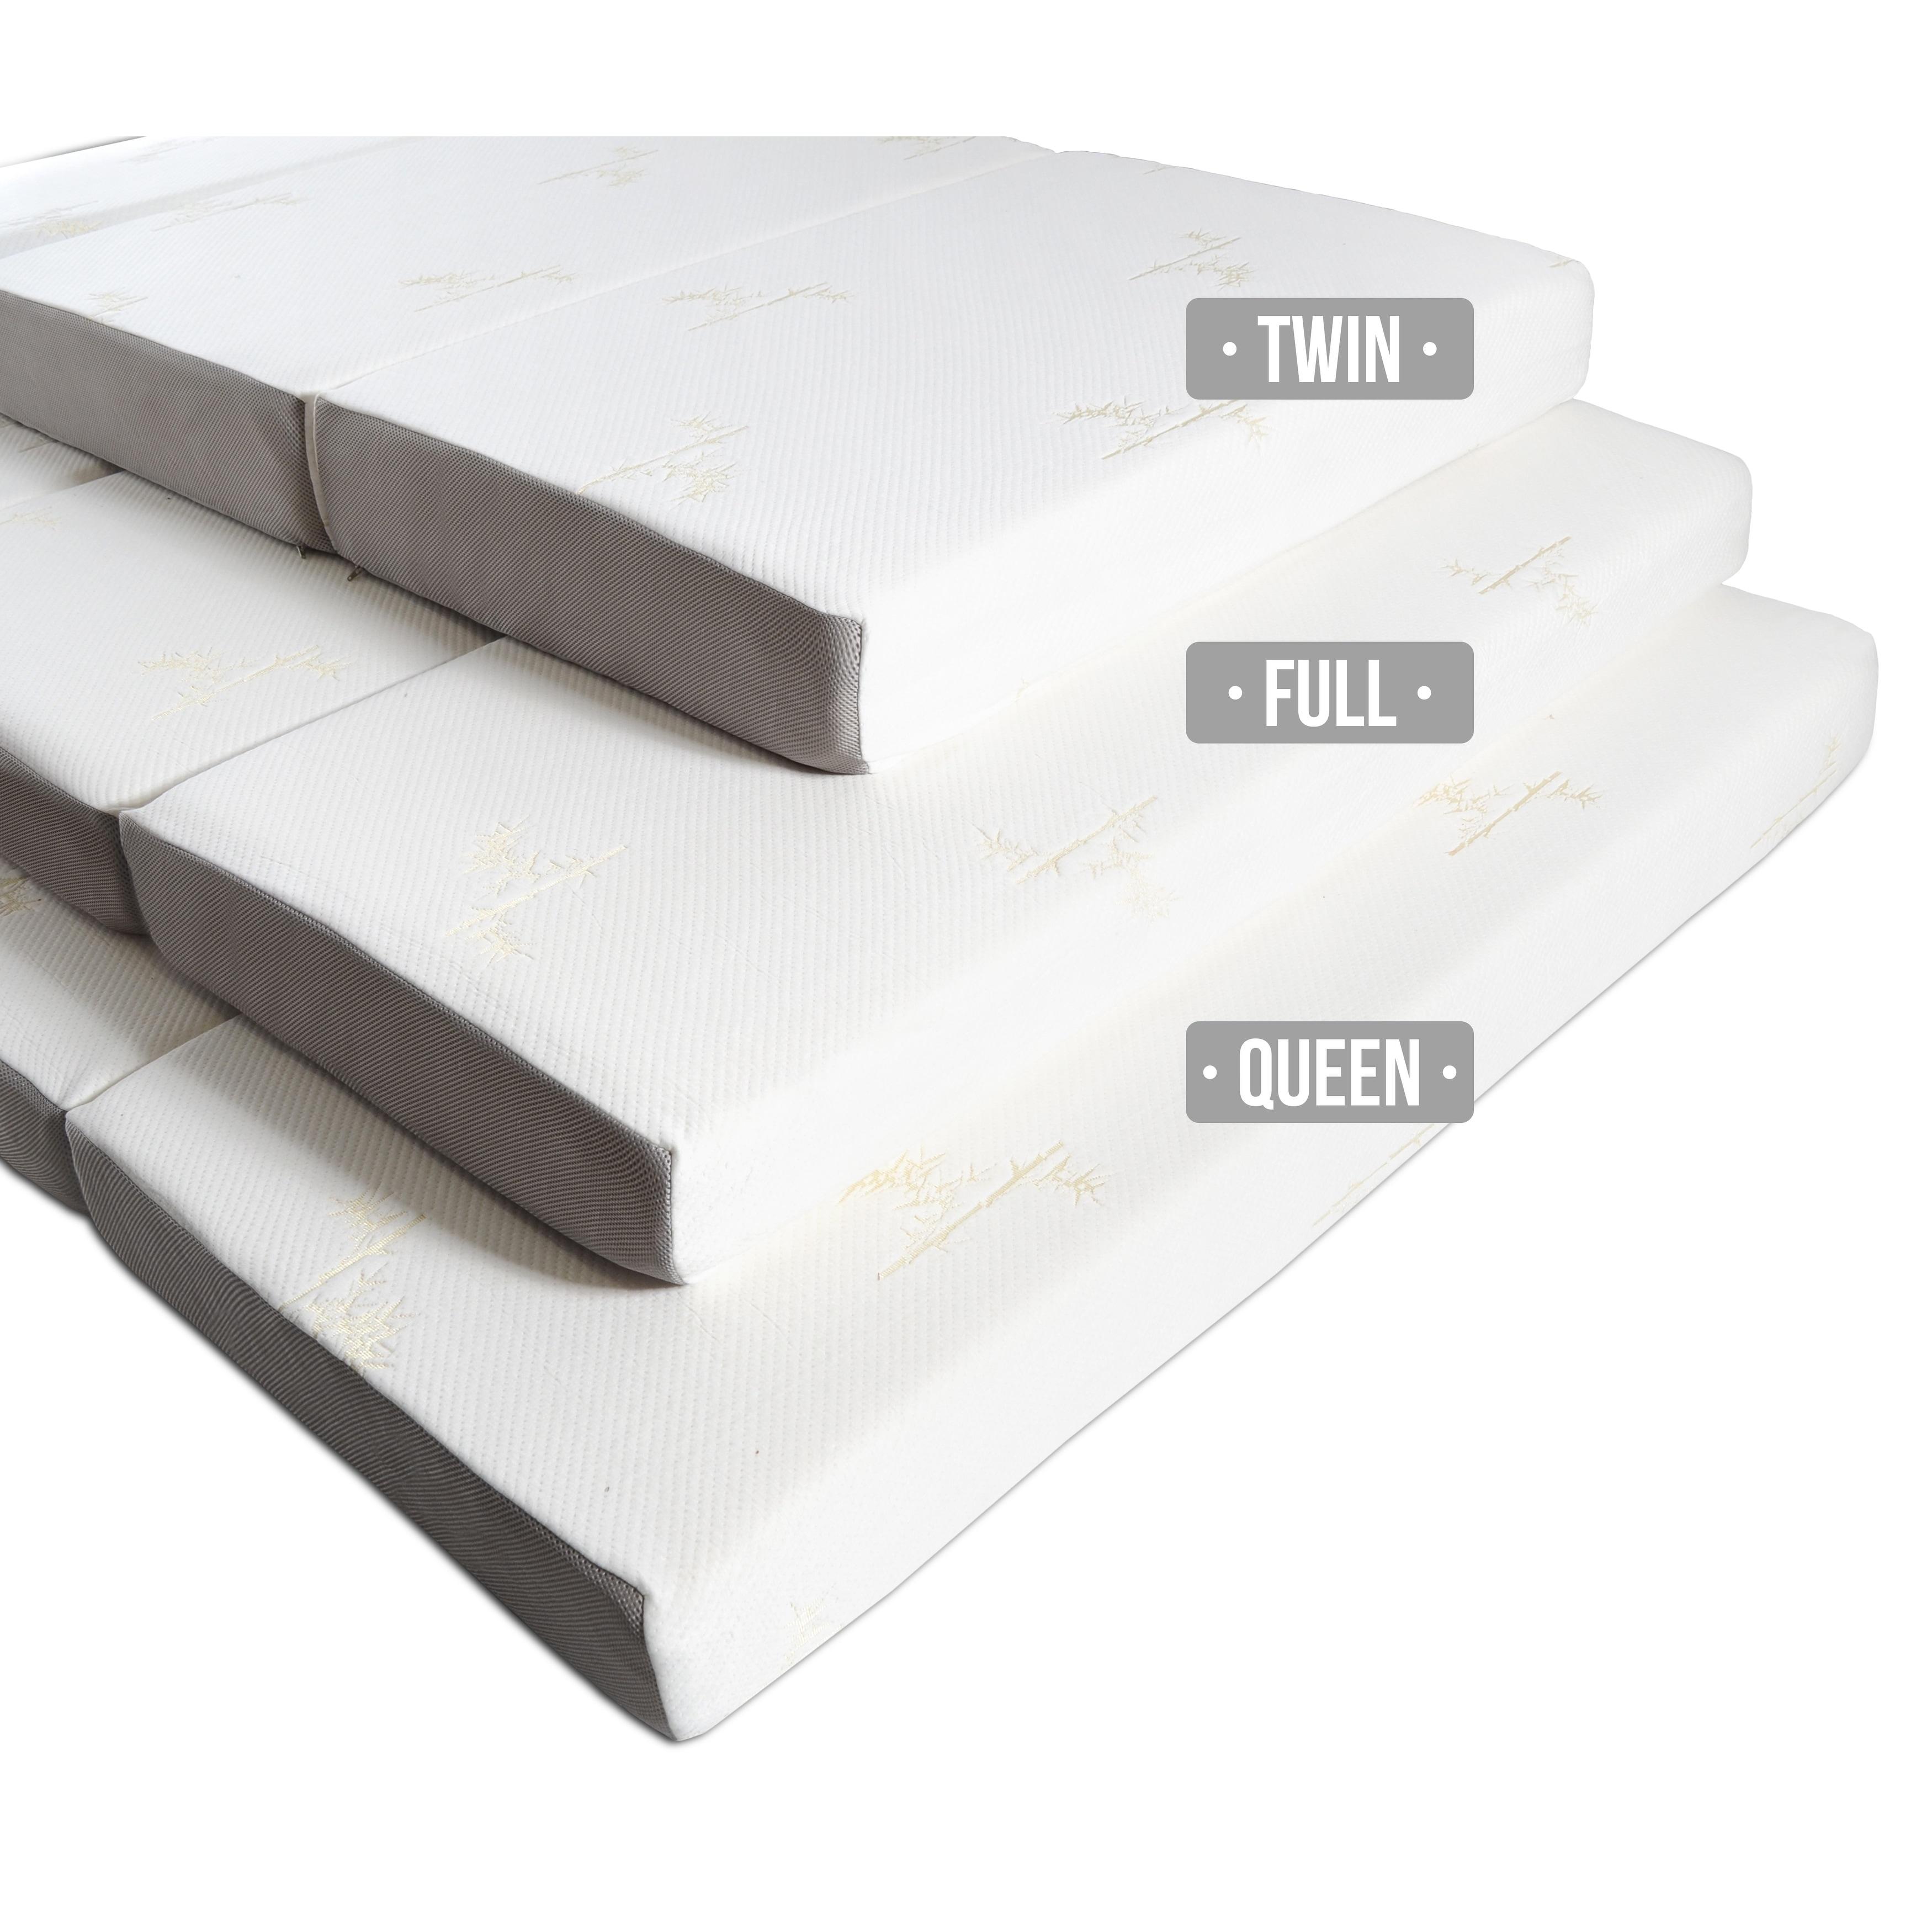 - Shop Milliard 6-inch Memory Foam Tri-fold Full-size Mattress With